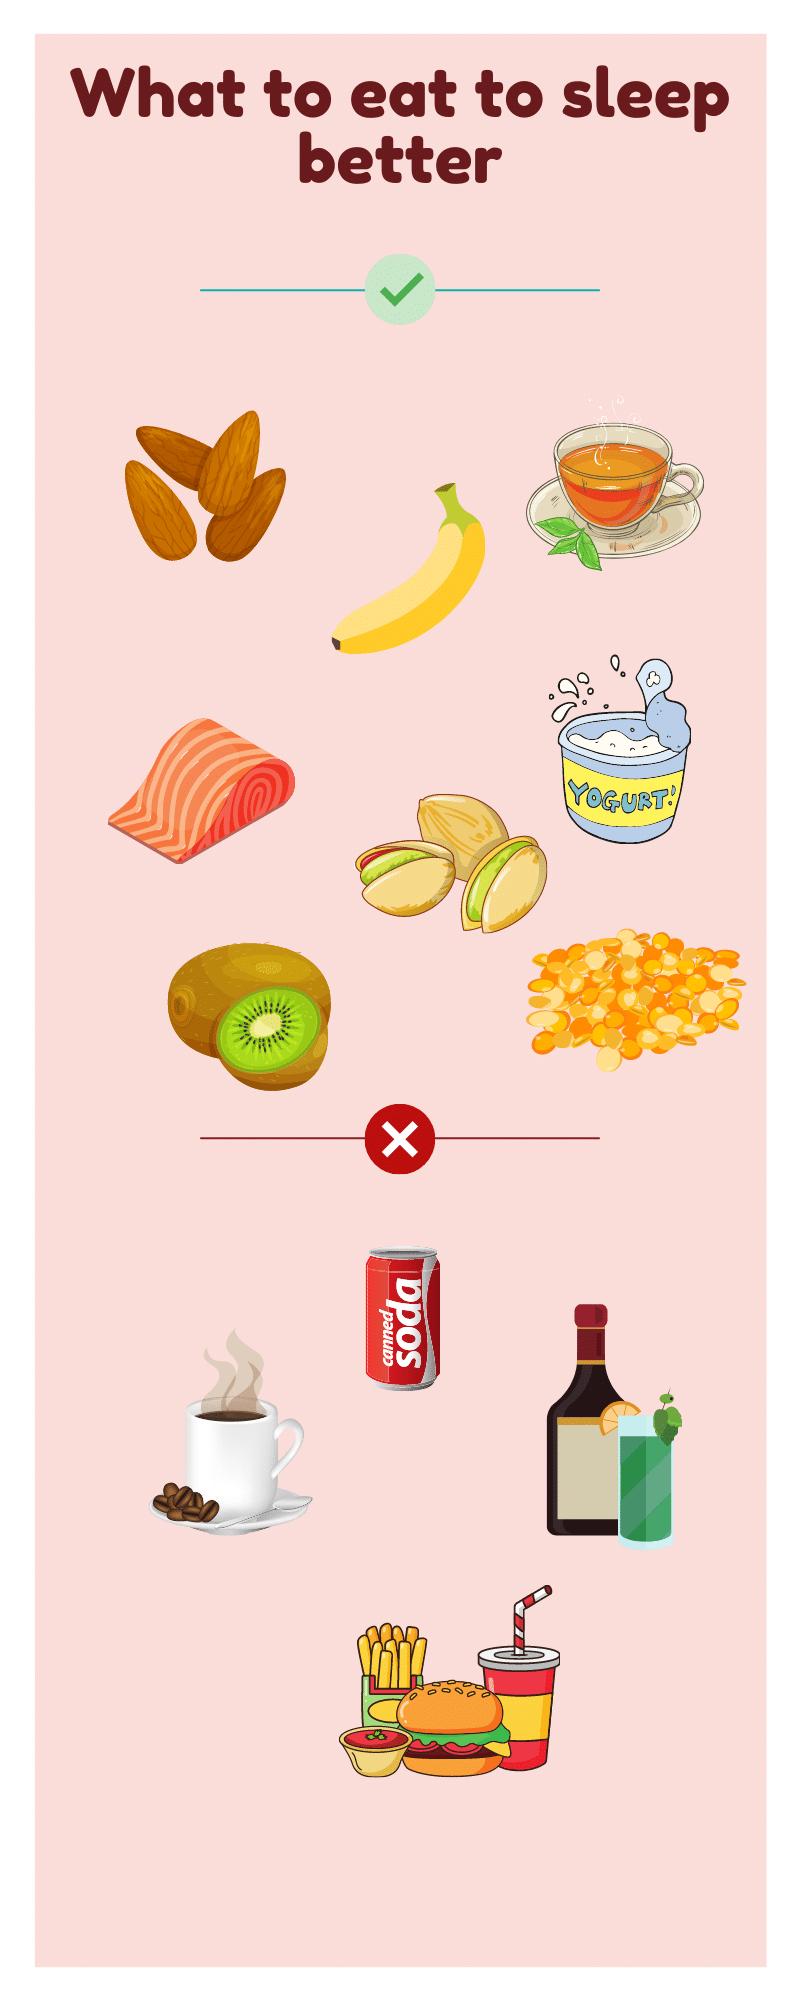 Foods to help you sleep better